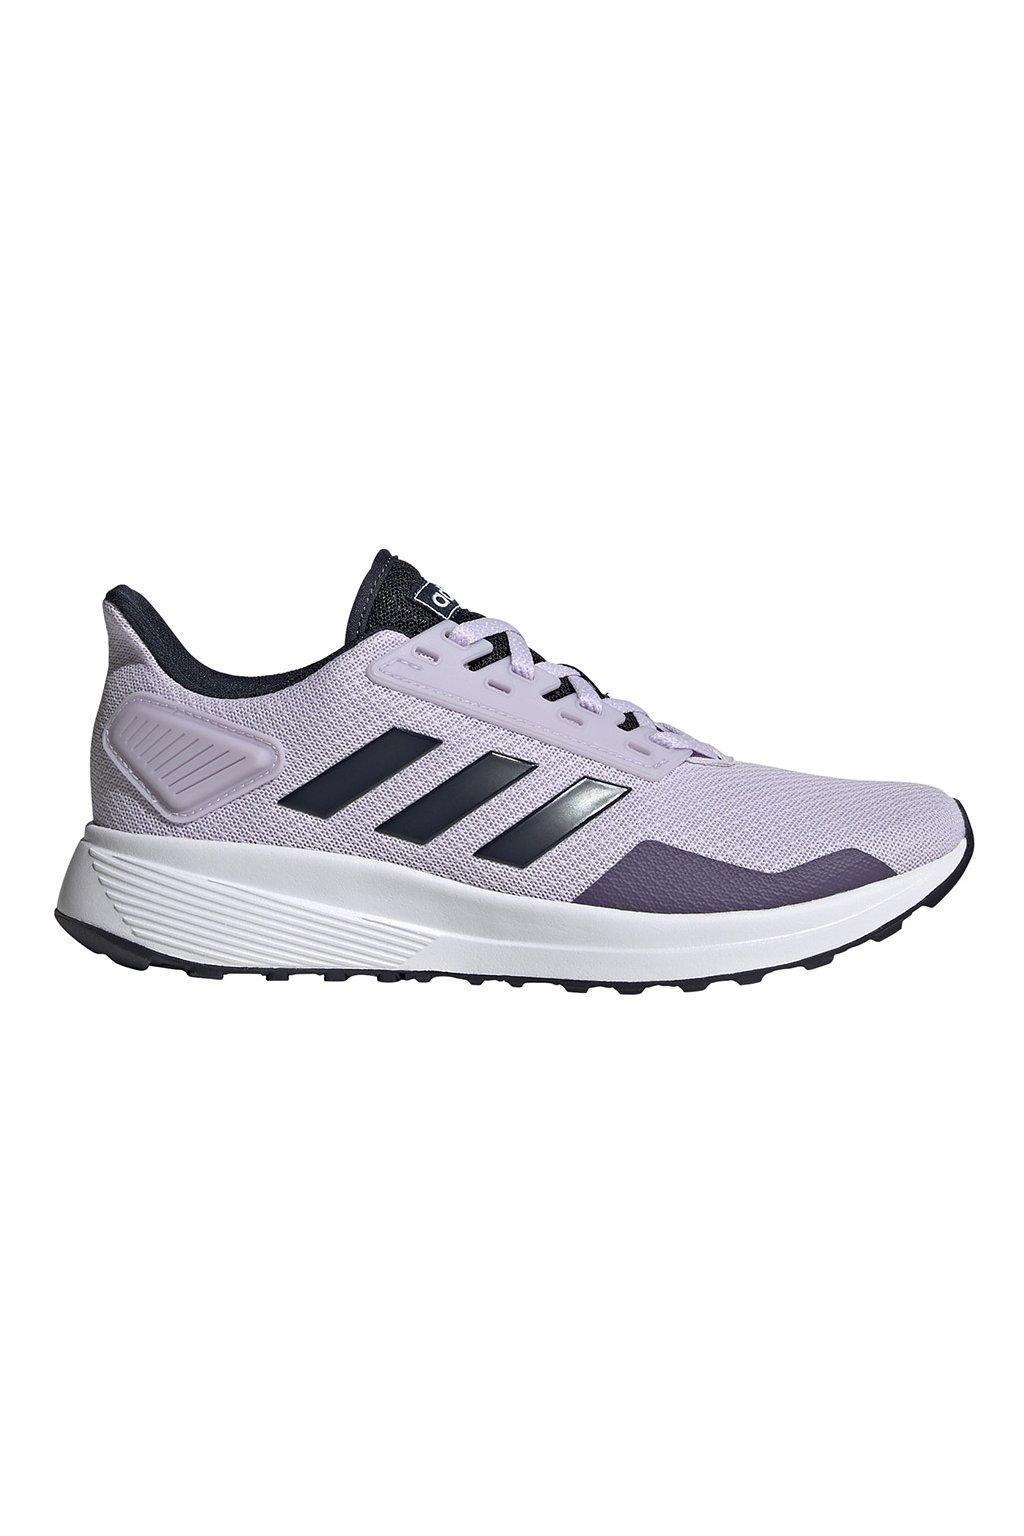 Dámske tenisky adidas Duramo 9 fialové EG2939